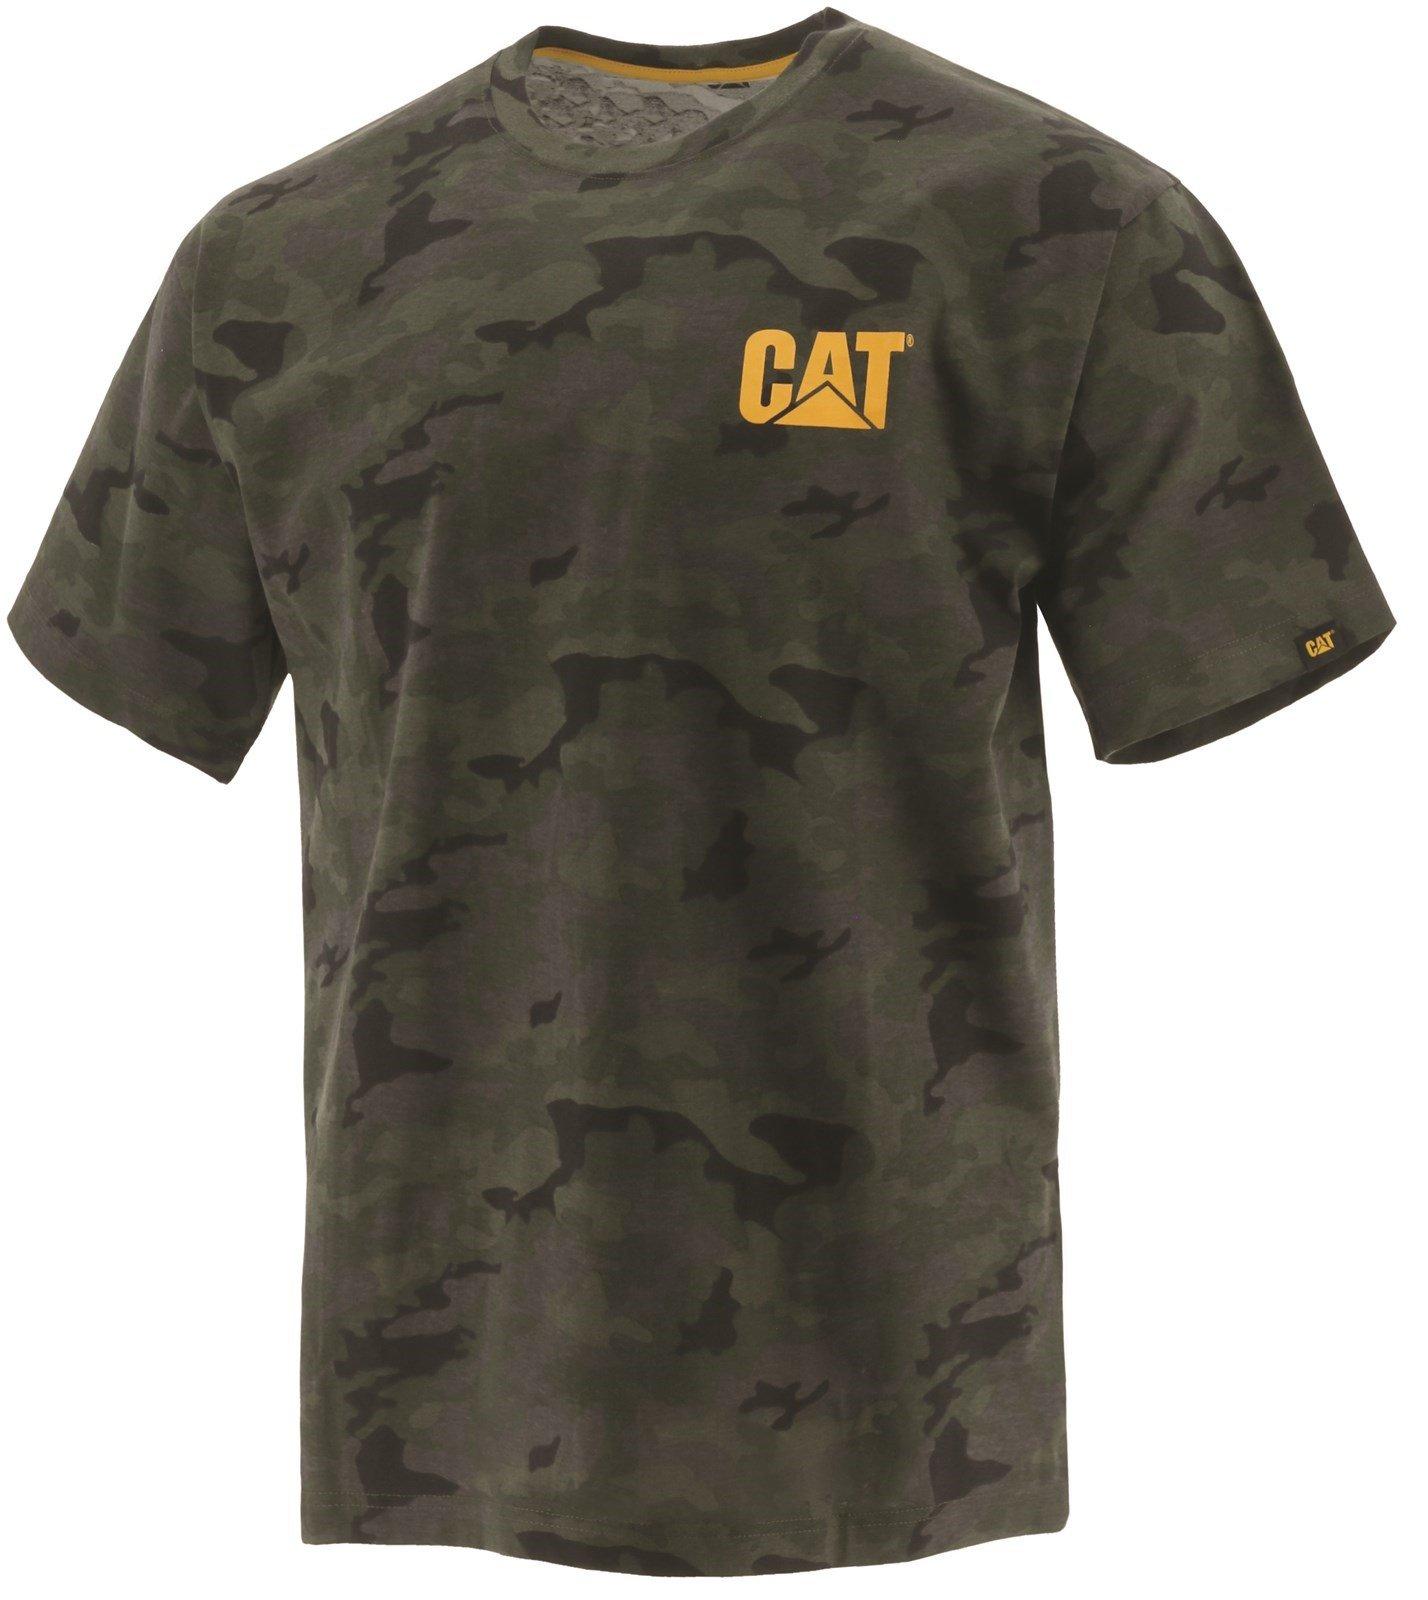 Caterpillar Unisex Trademark T-Shirt Night Camo 32227 - Night Camo Sml